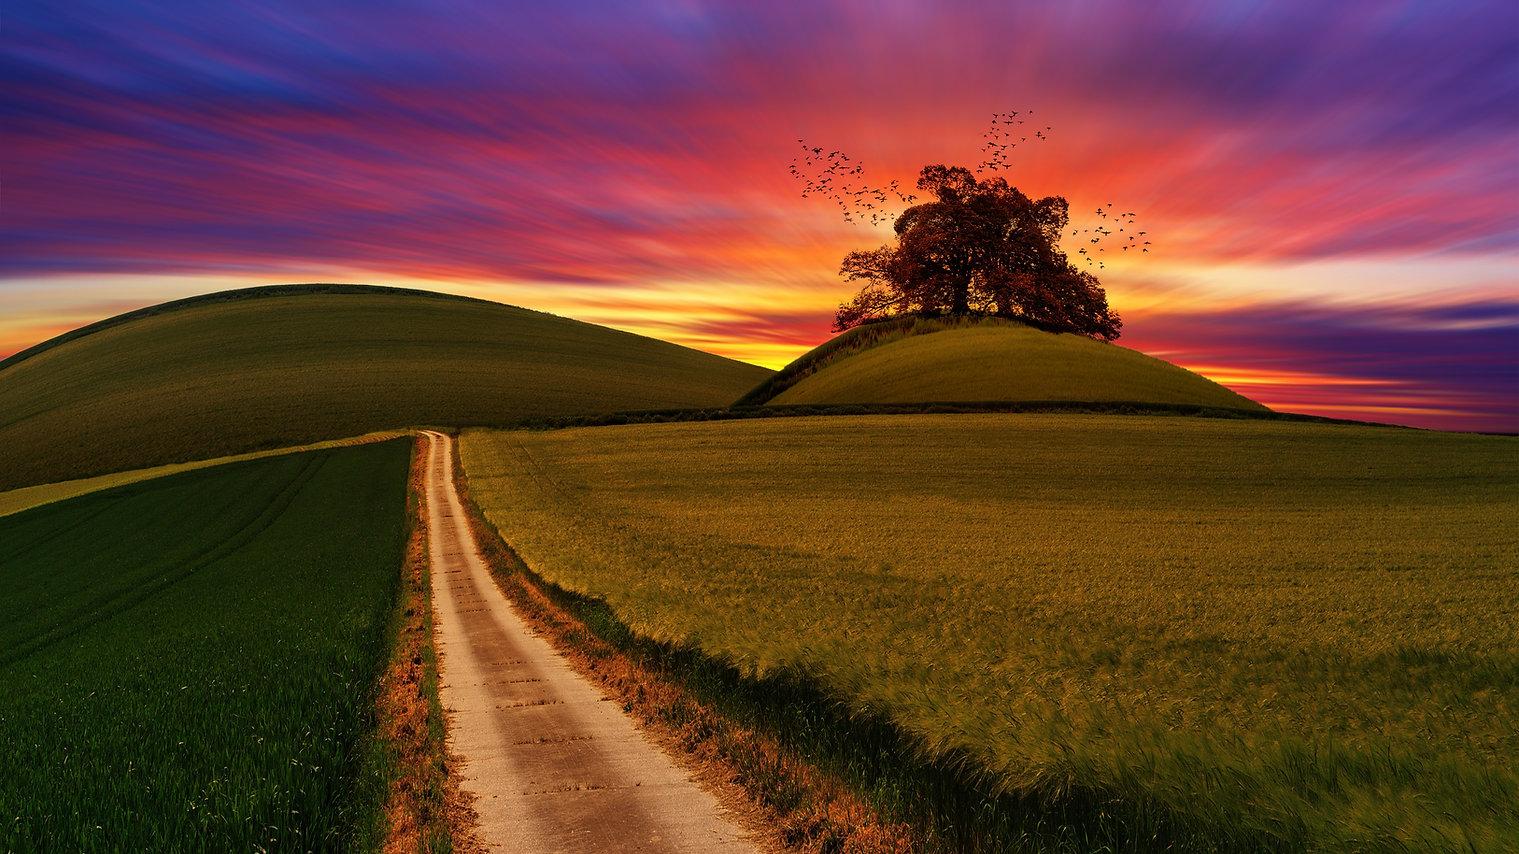 sunset_homepage_image_counttheomer.jpg